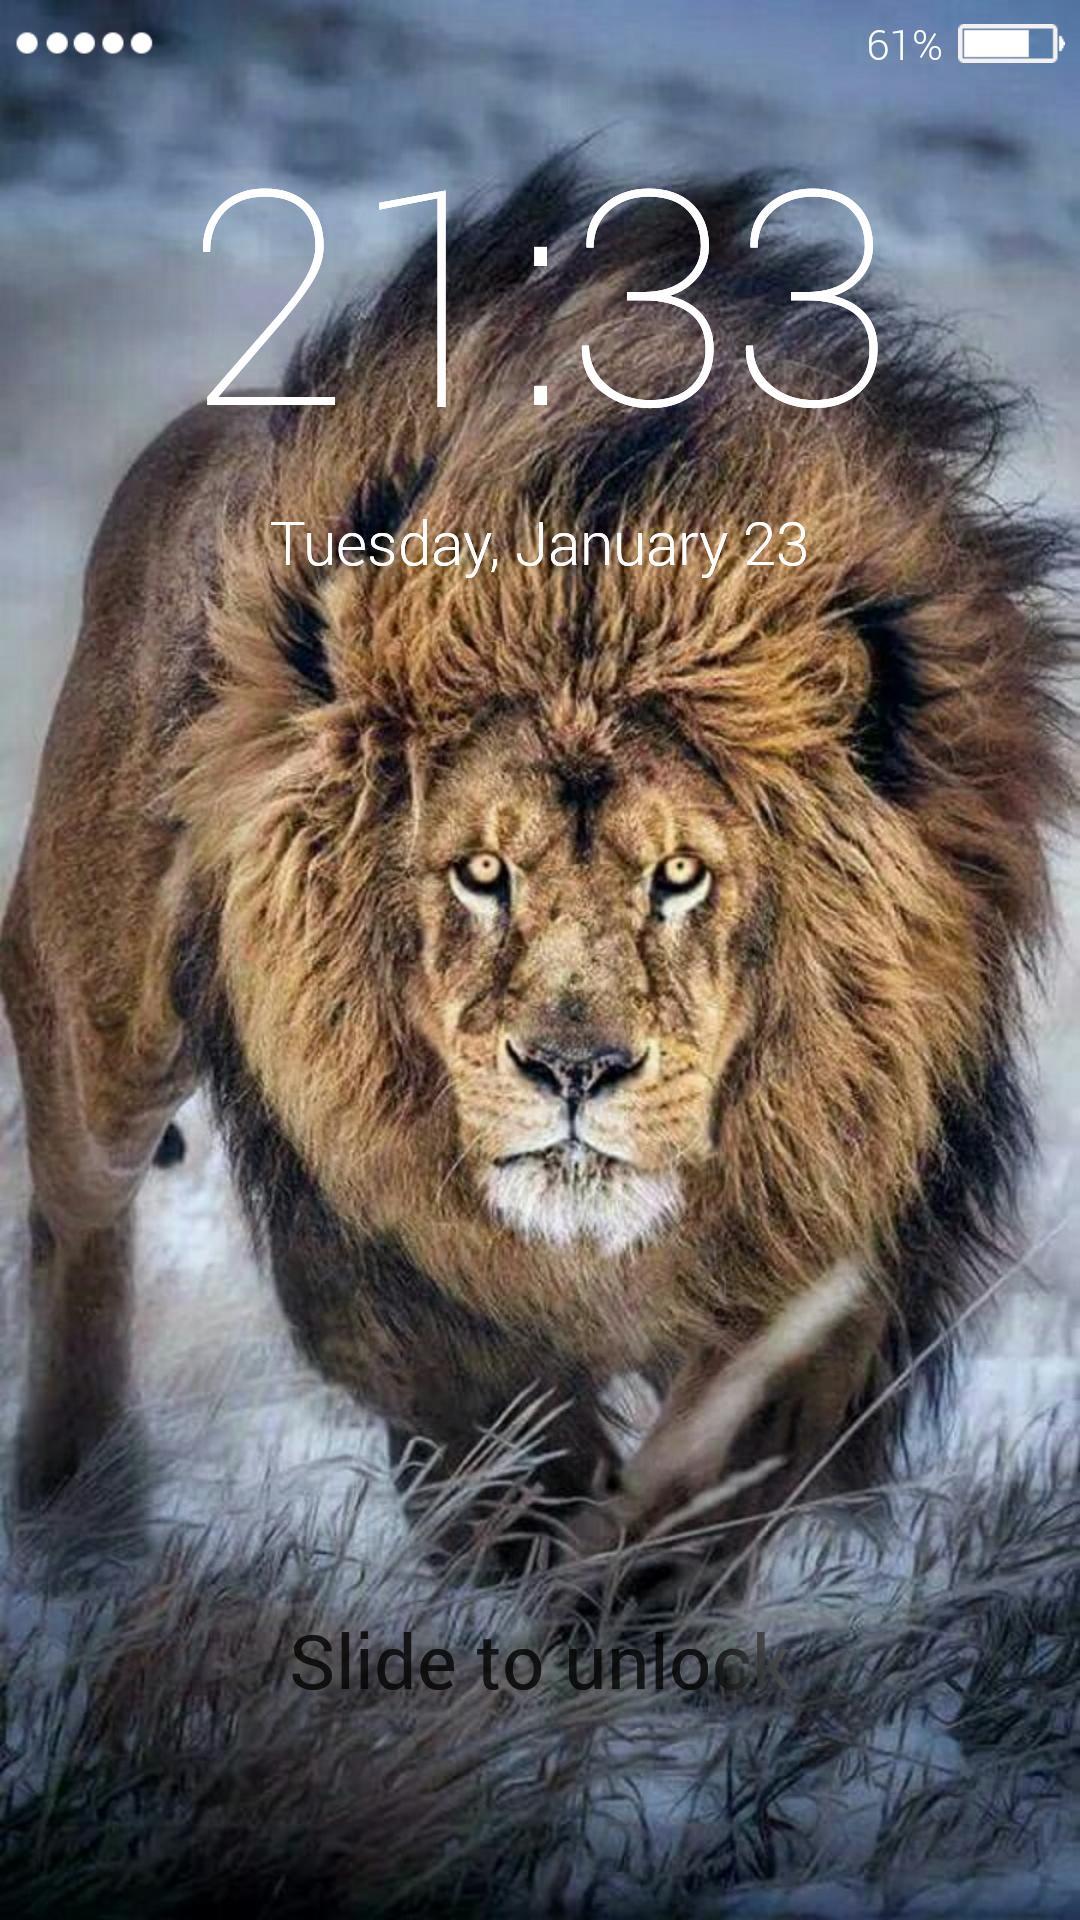 Wallpaper Of Lion Posted By John Peltier